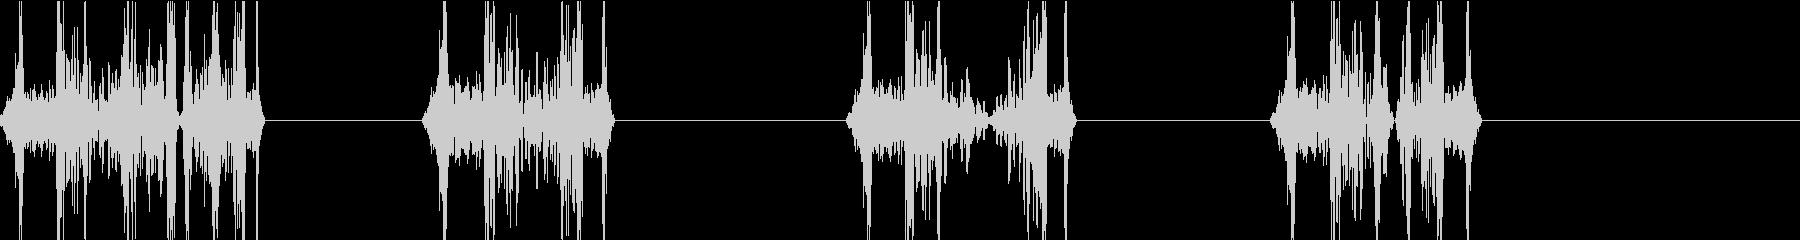 DJプレイ スクラッチ・ノイズ 111の未再生の波形